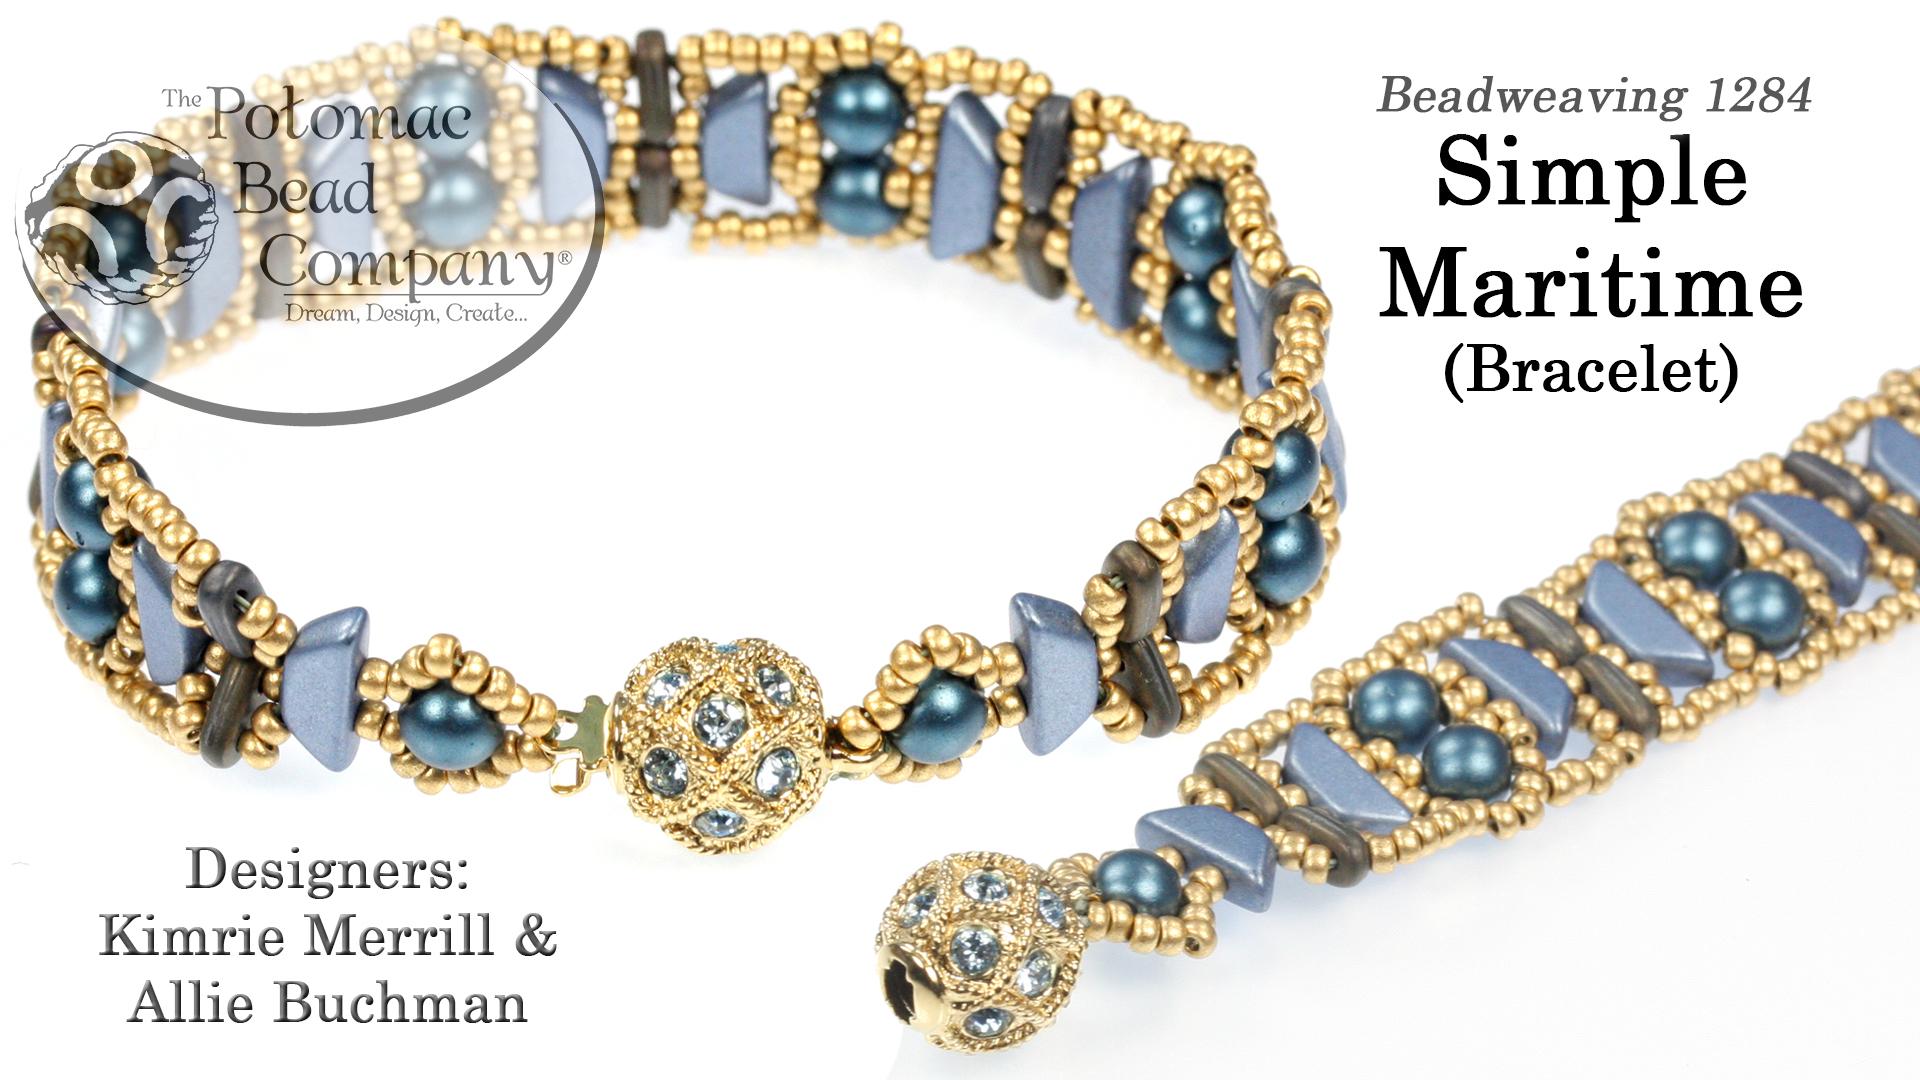 How to Bead / Videos Sorted by Beads / Par Puca® Bead Videos / Simple Maritime Bracelet Tutorial